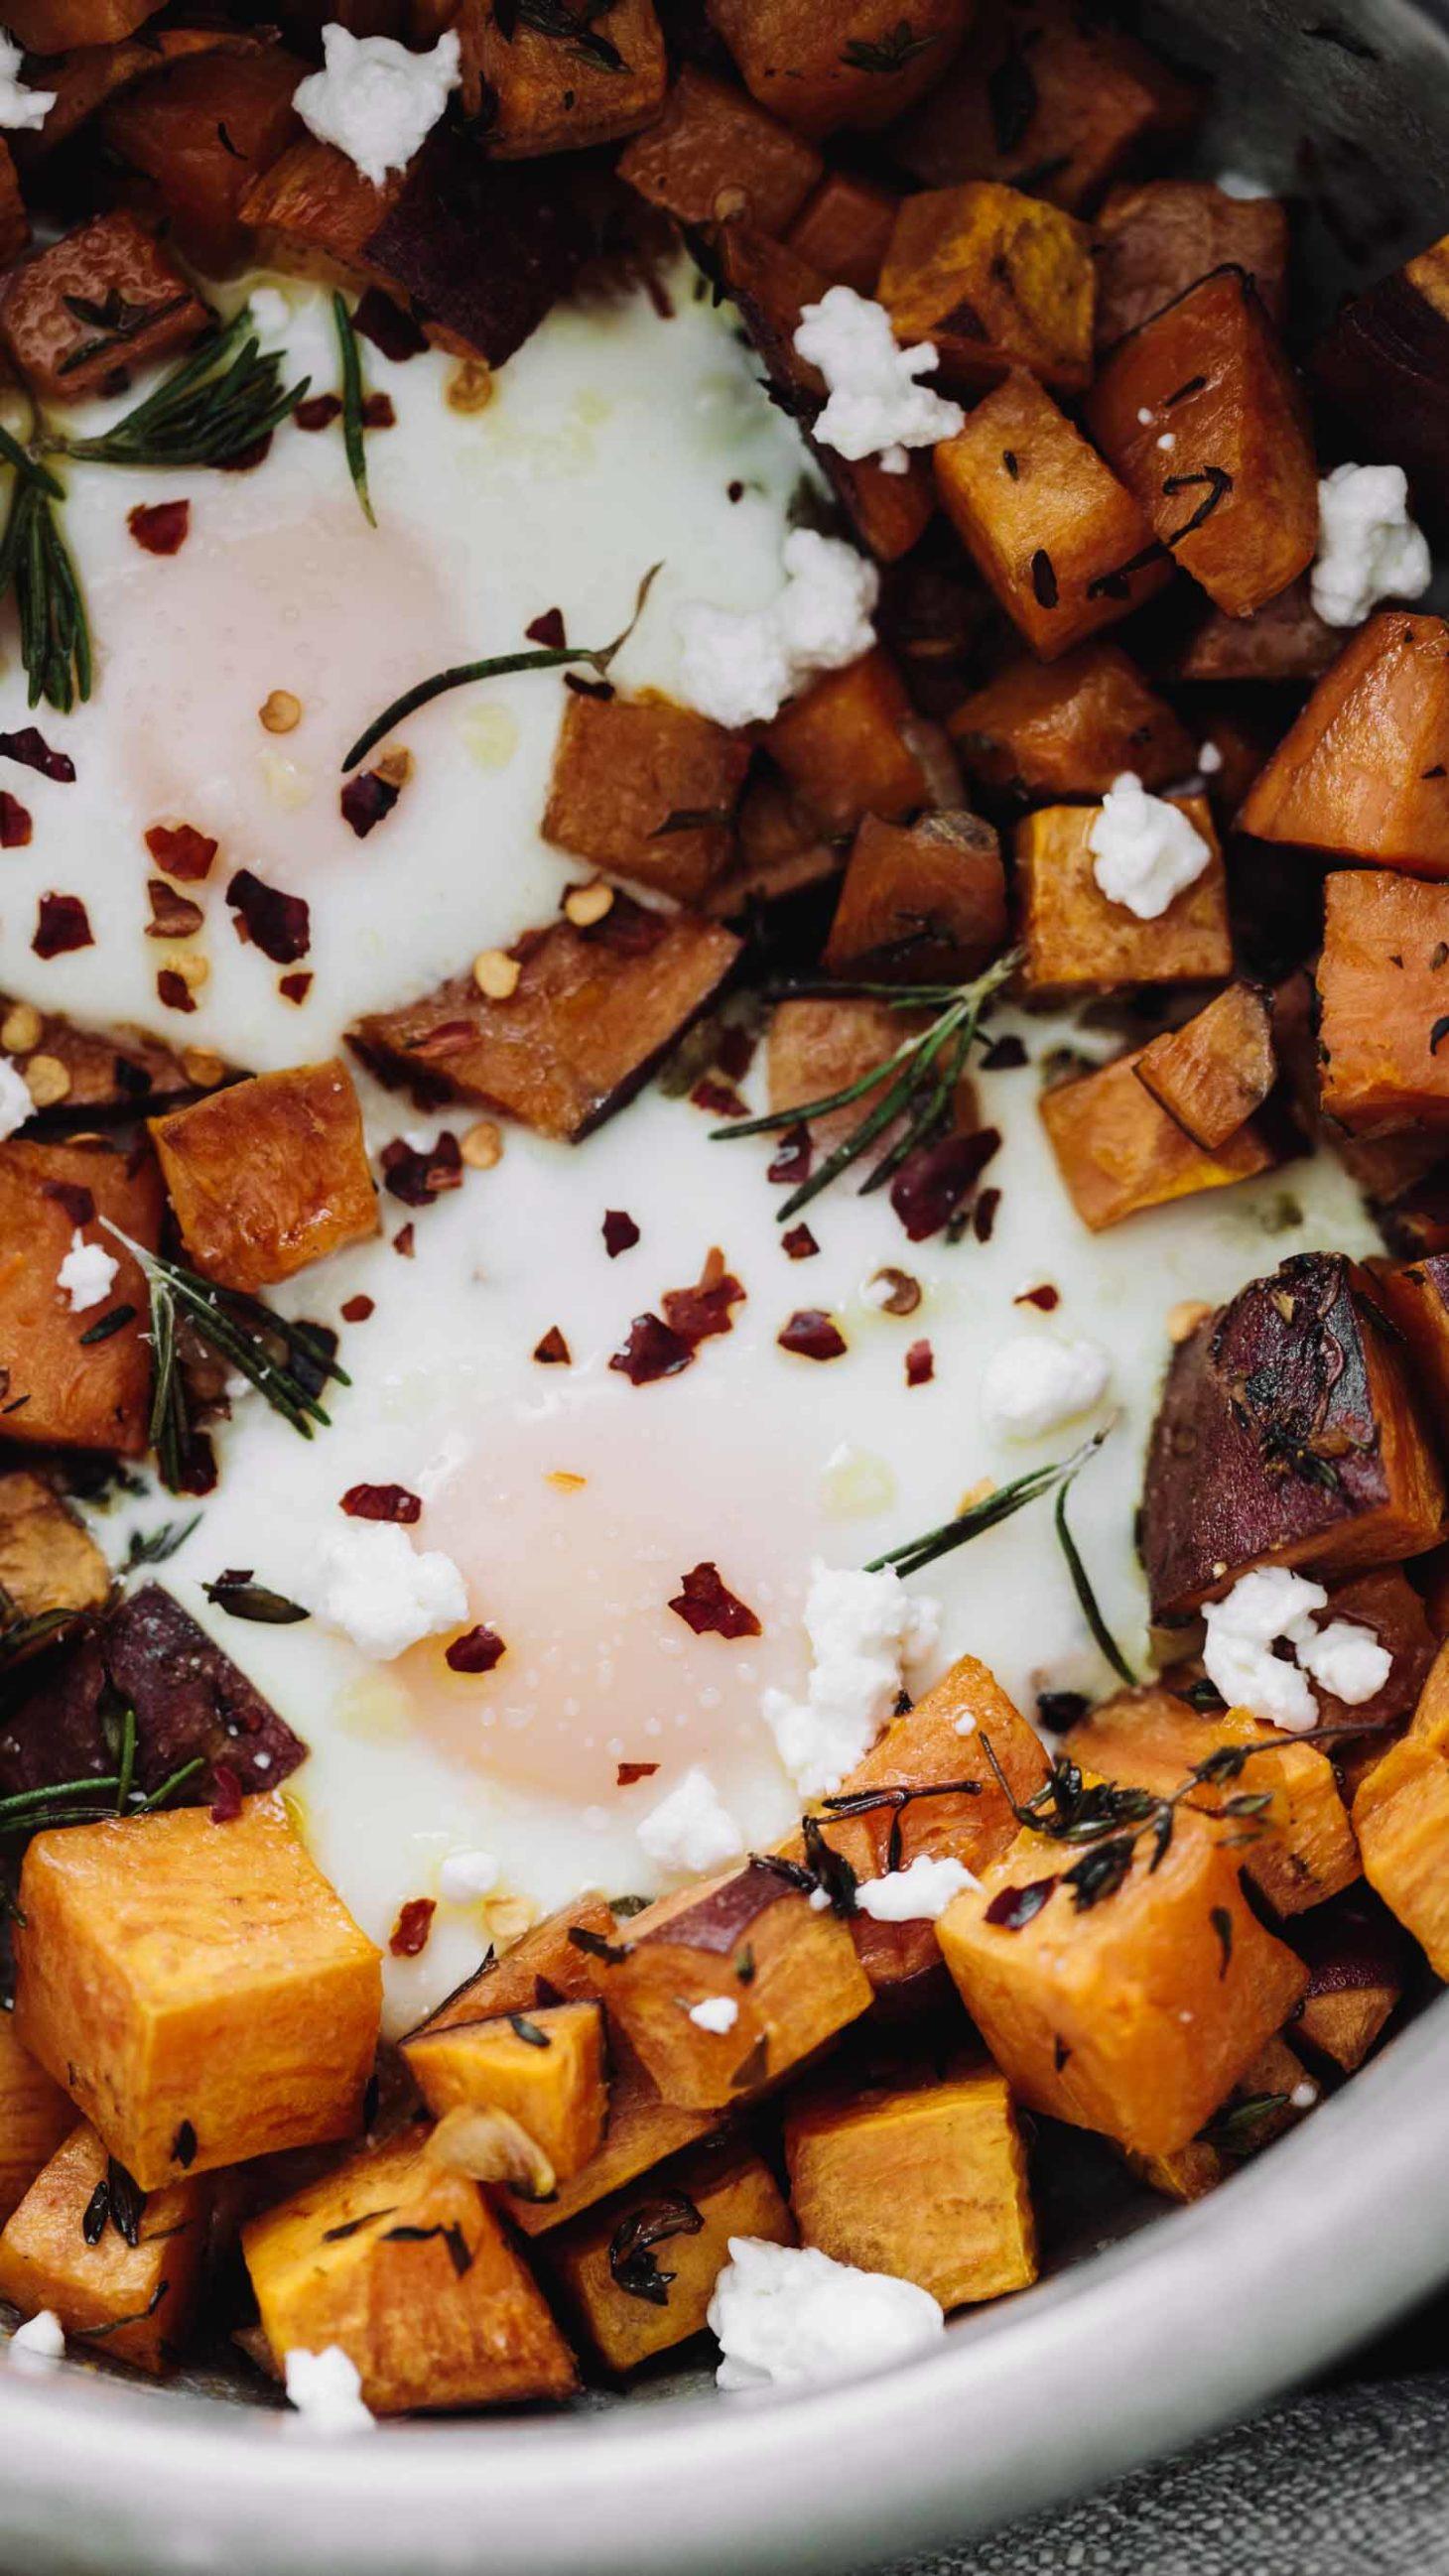 Roasted Sweet Potatoes Gorgonzola And Baked Eggs